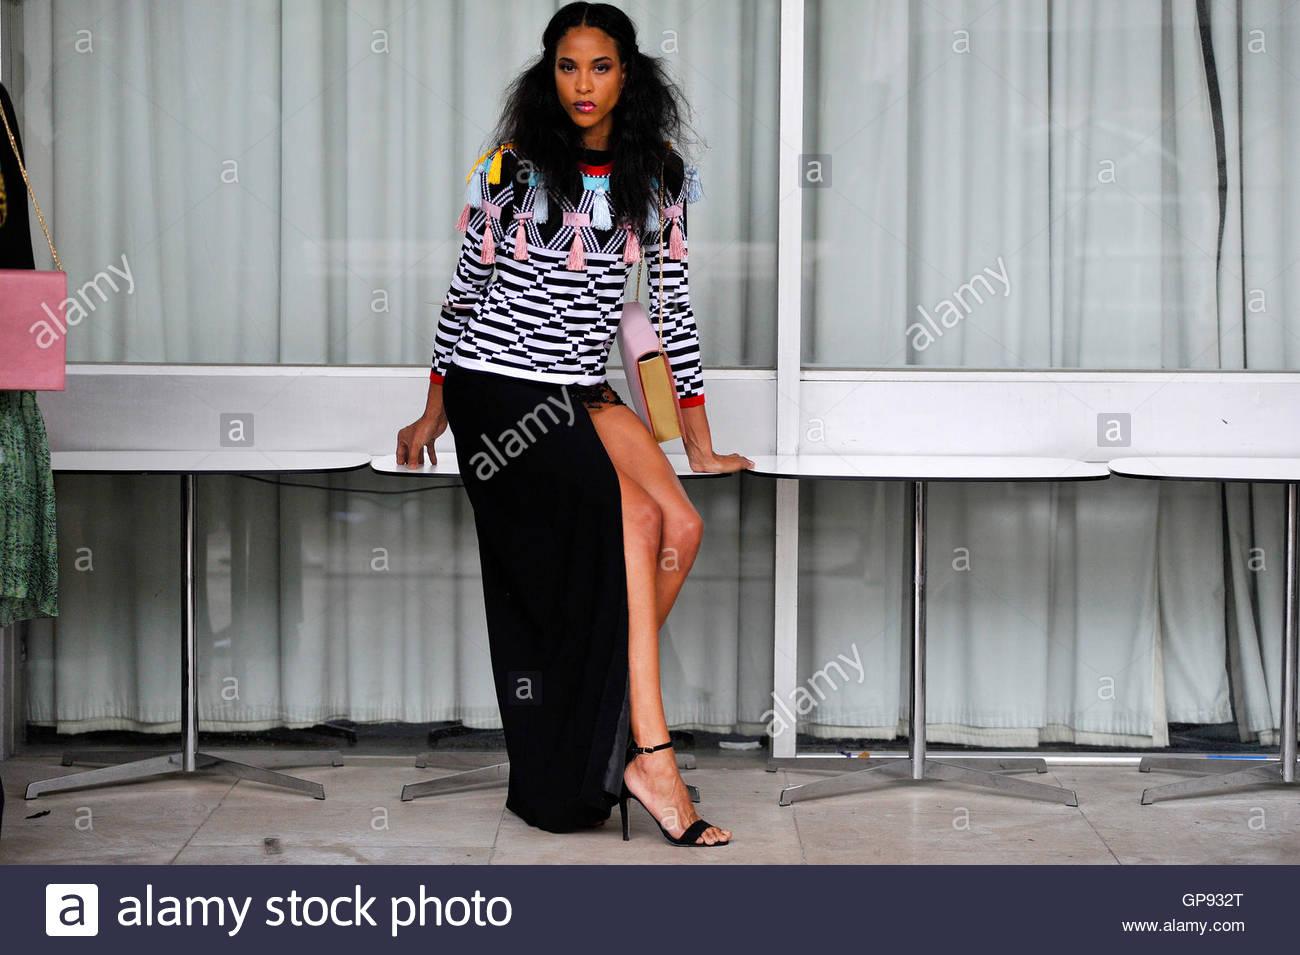 Model Lauren Lambert backstage at Africa Utopia Fashion Event Southbank London, England UK September 3 2016. - Stock Image